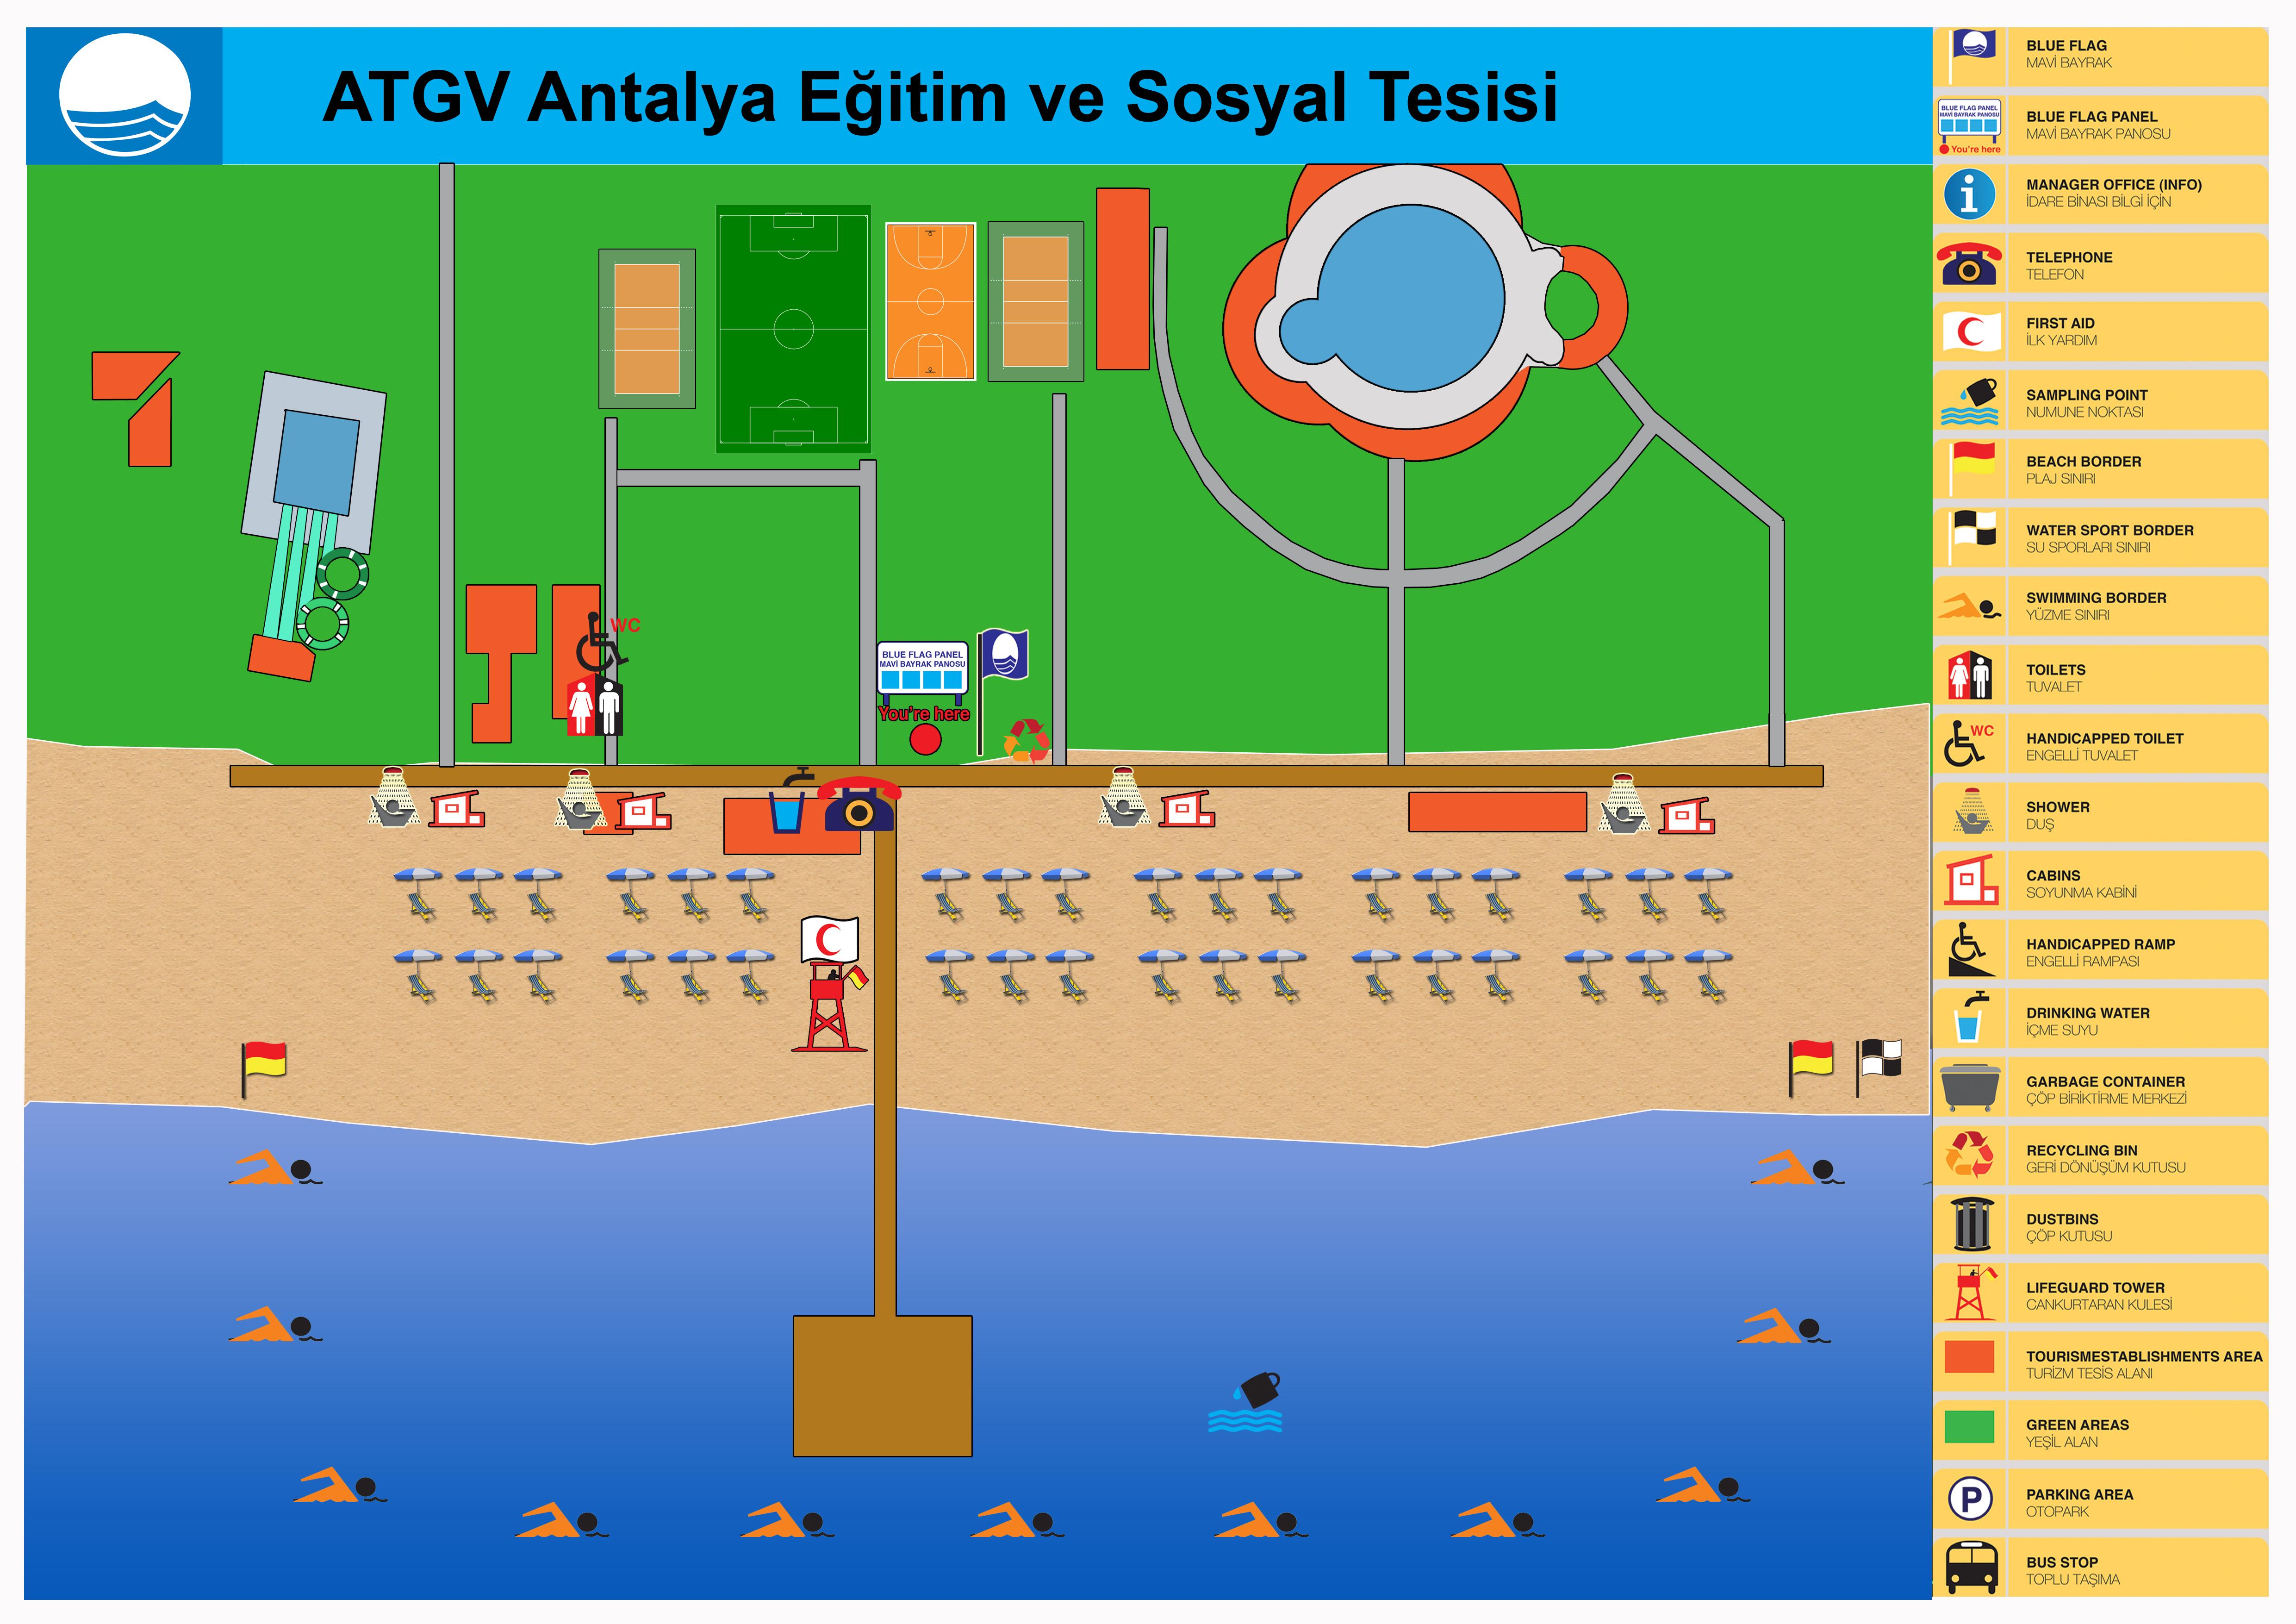 http www mavibayrak org tr tr plajdetay aspx plaj refno 1606